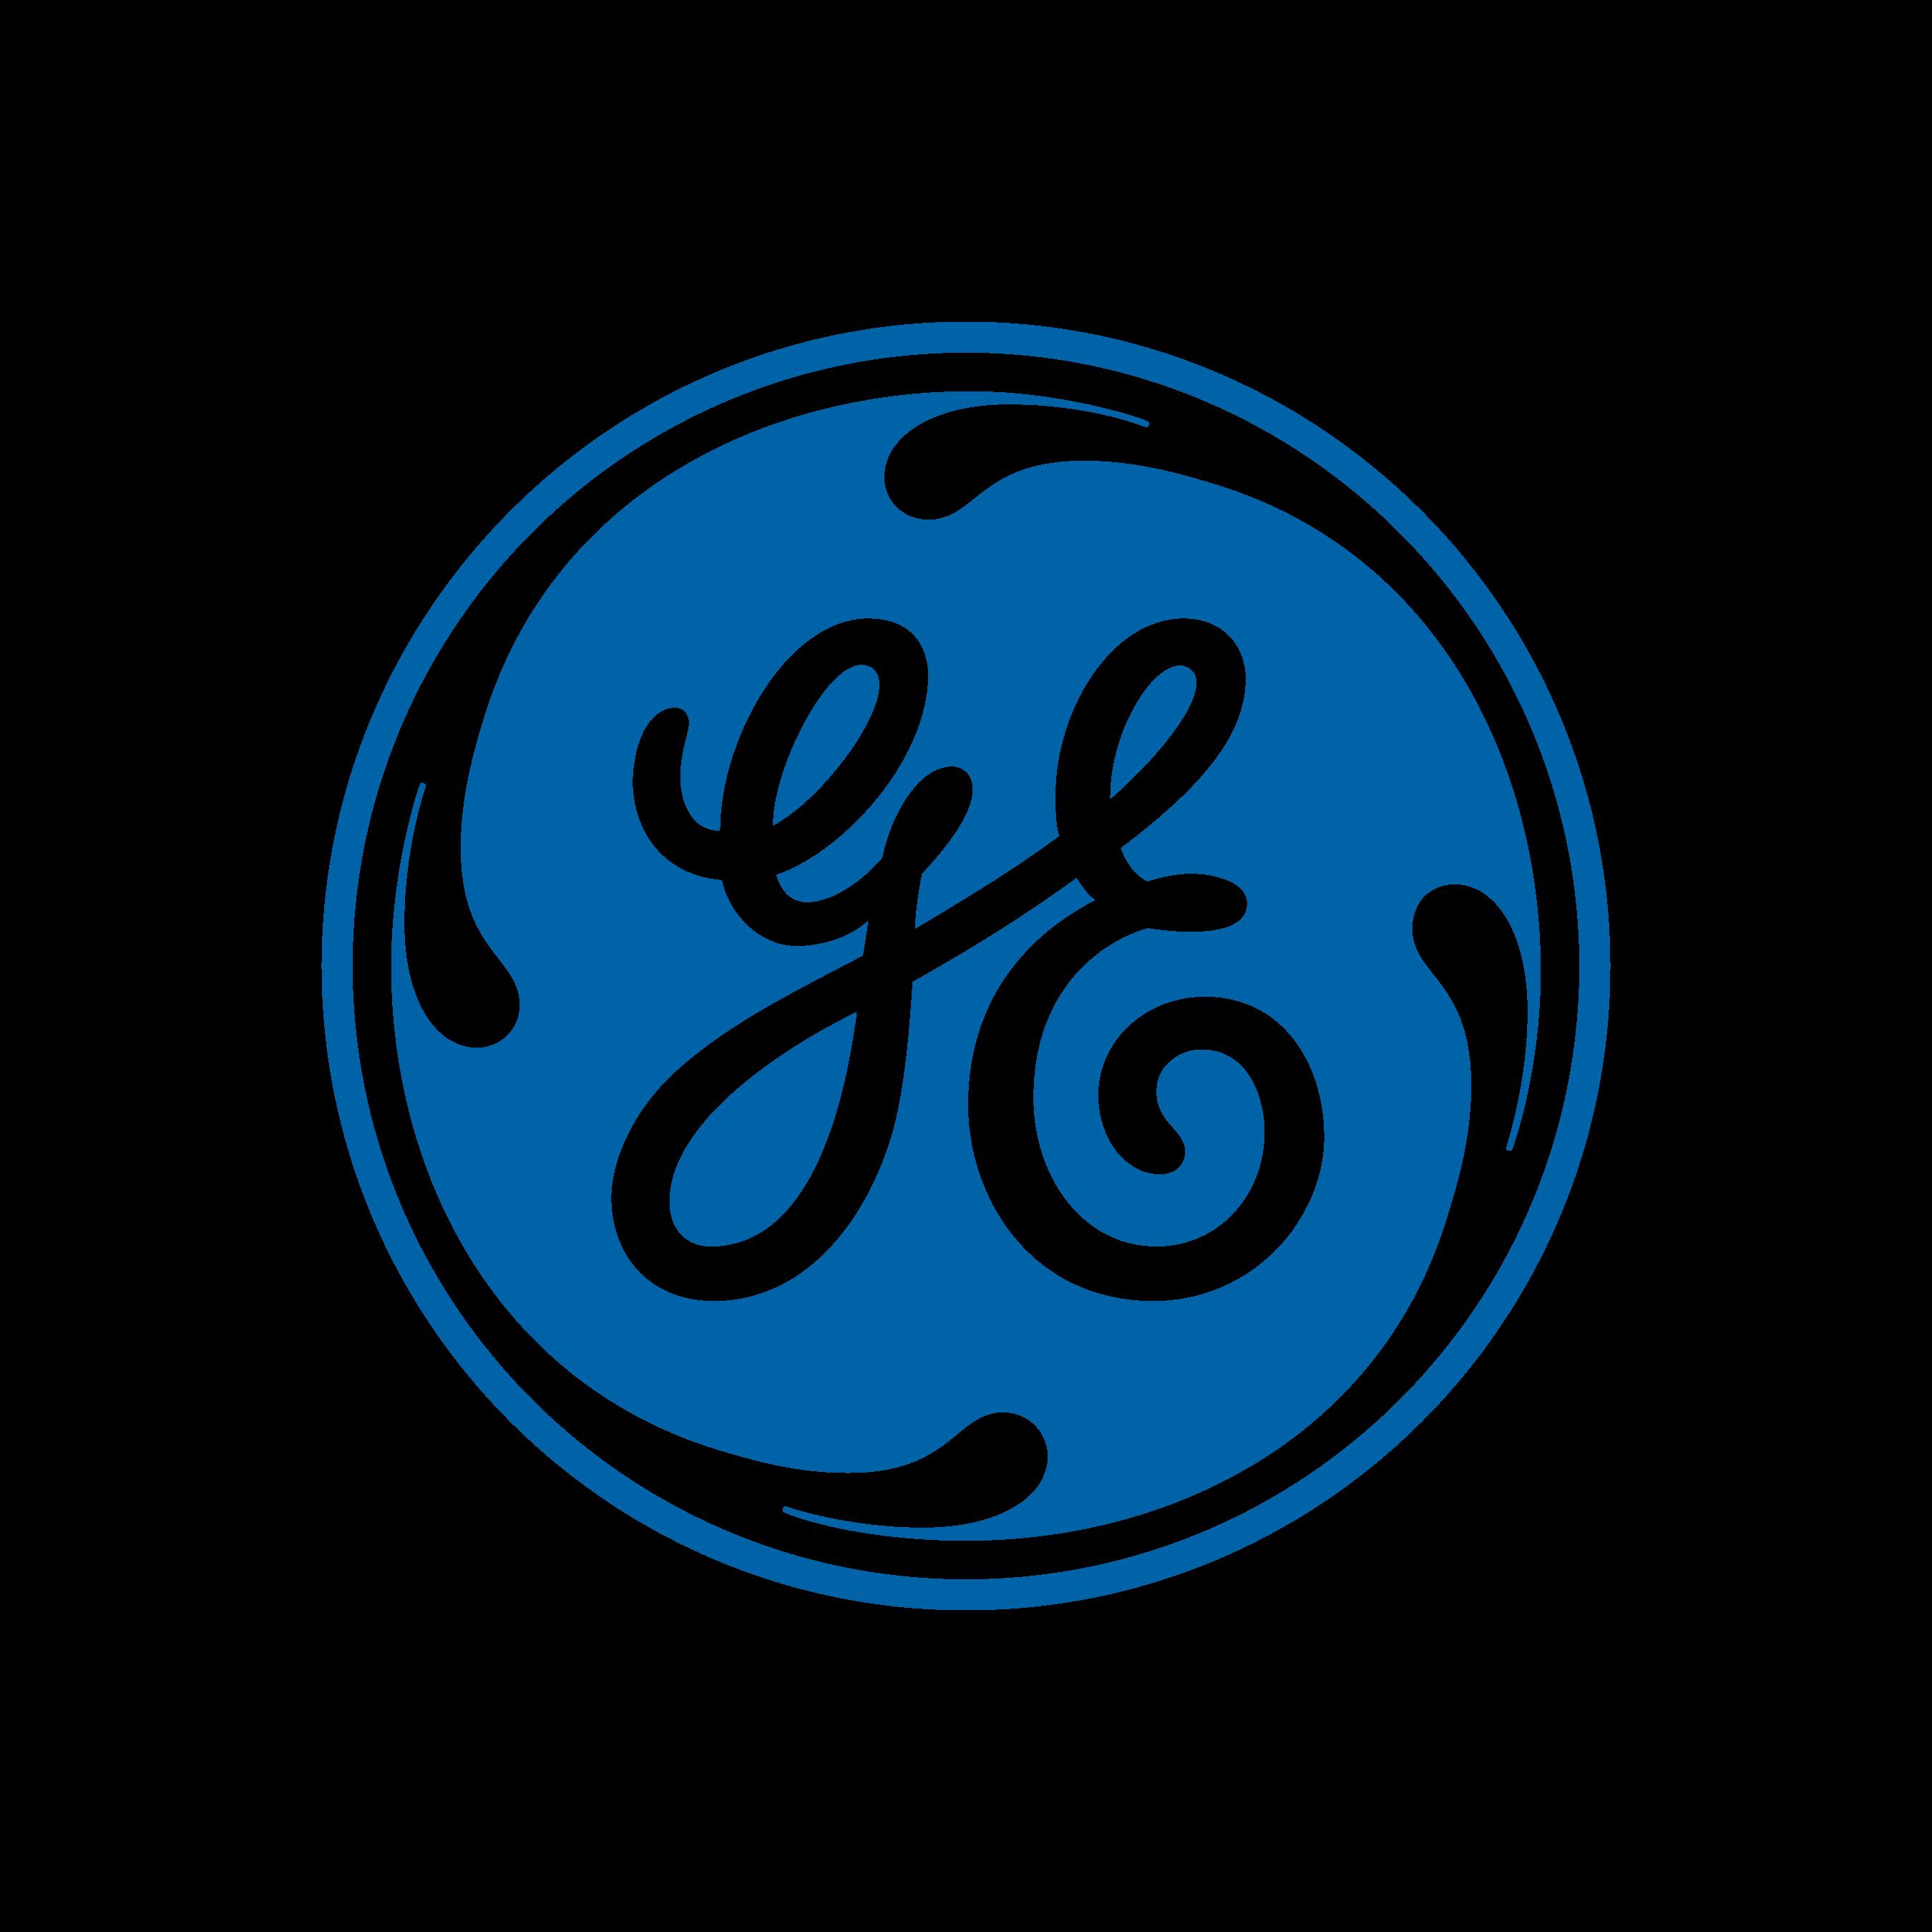 ge_monogram_blue_300 (004)